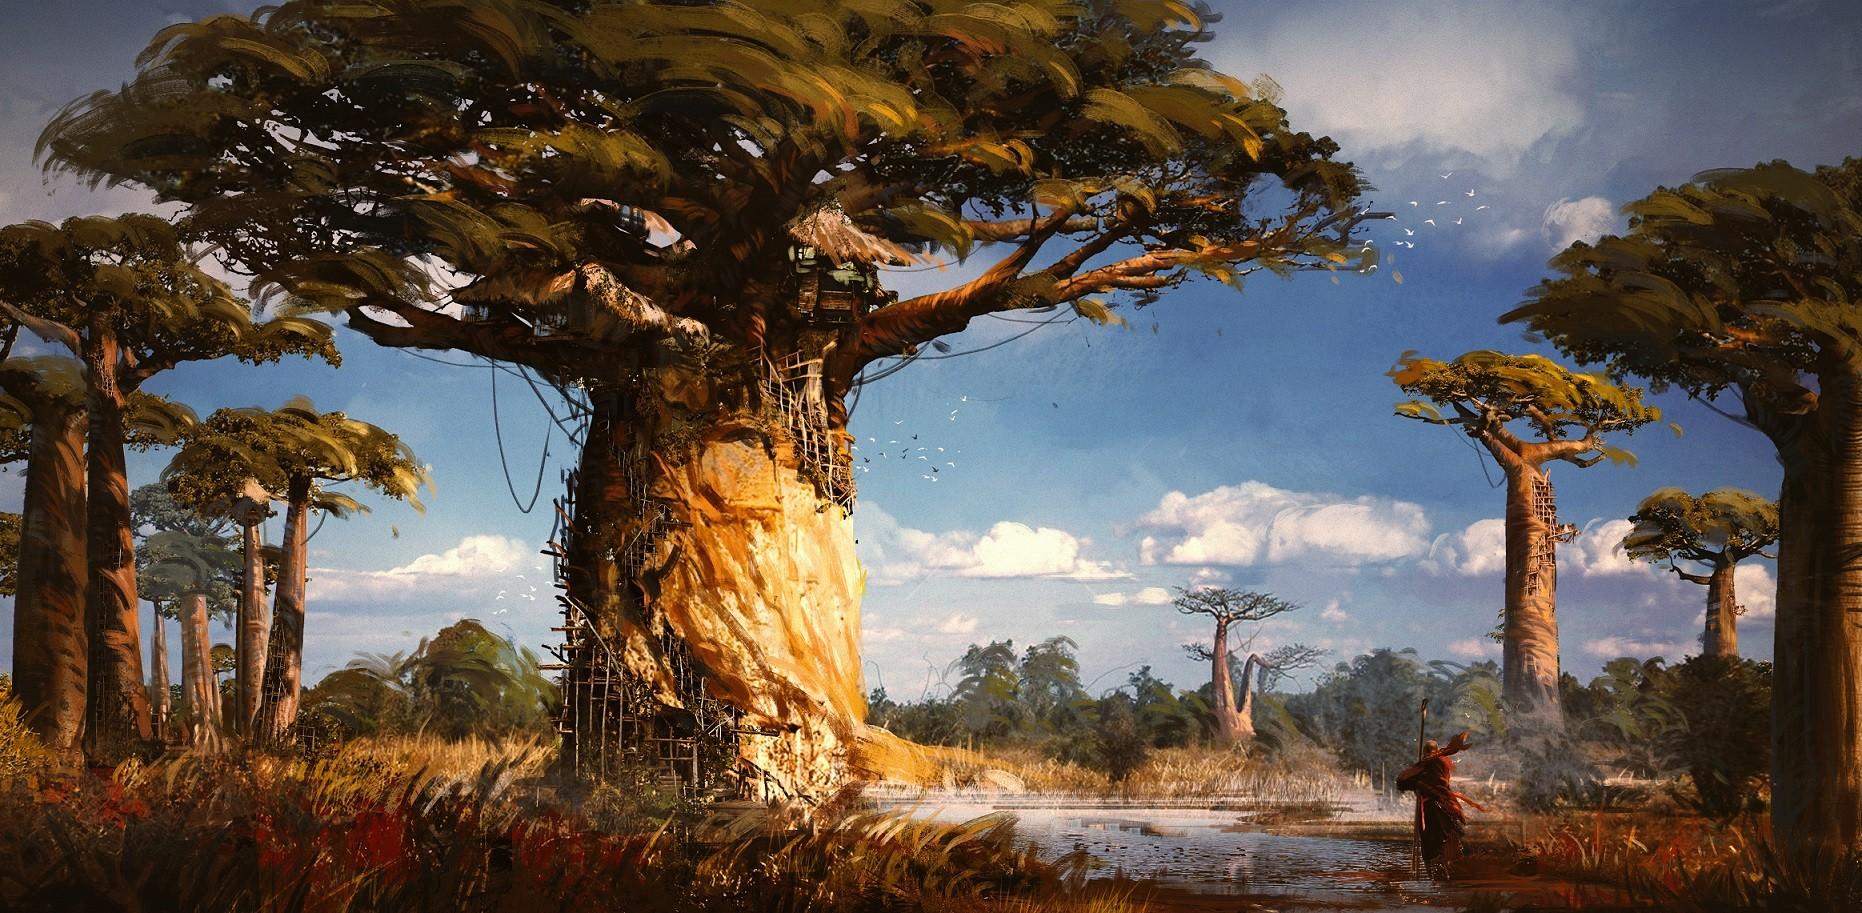 donglu-yu-baobab-treehouse-lowres.jpg